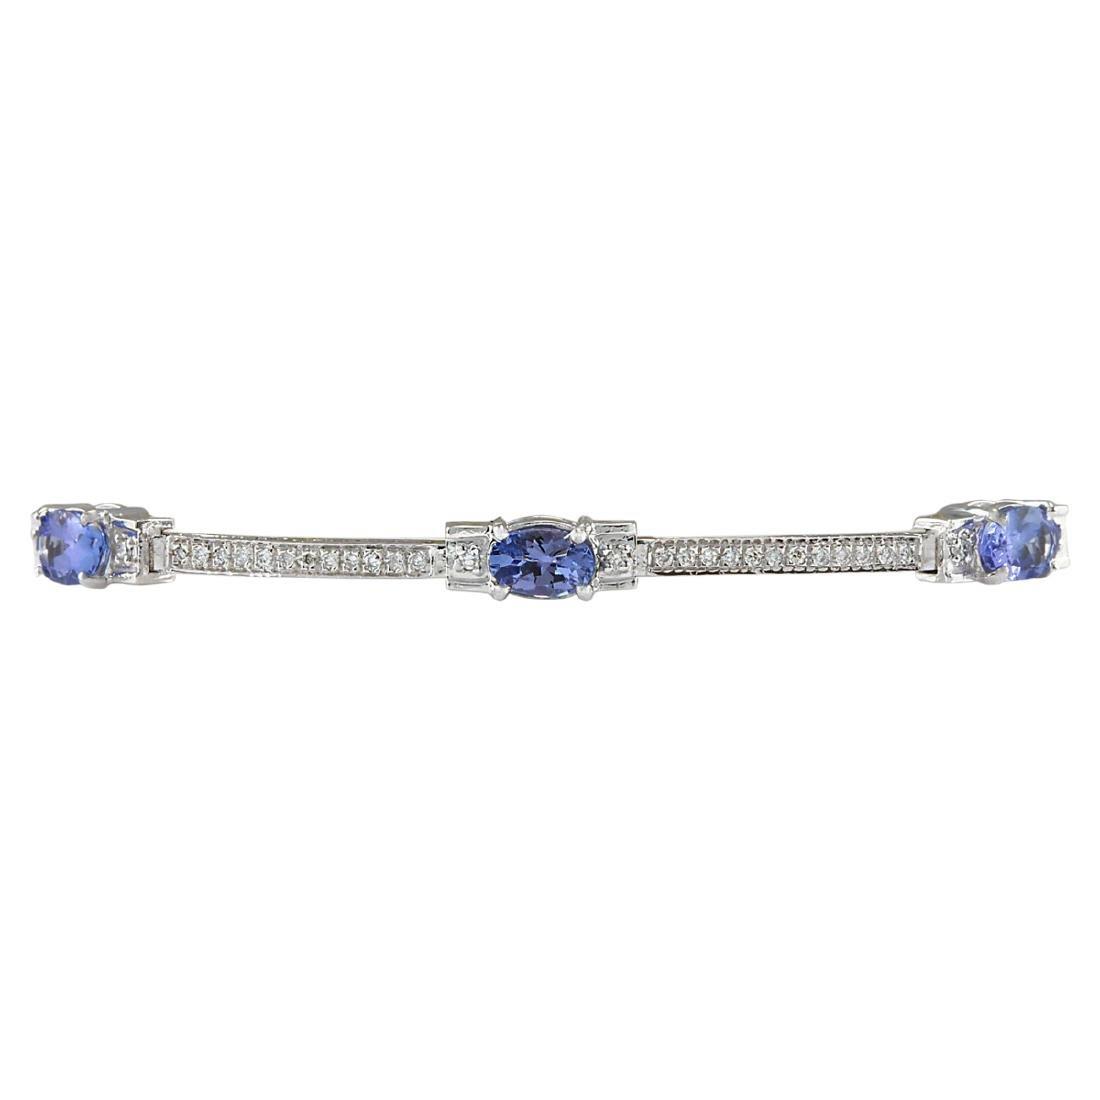 3.75 CTW Natural Tanzanite And Dimond Bracelet In 18K